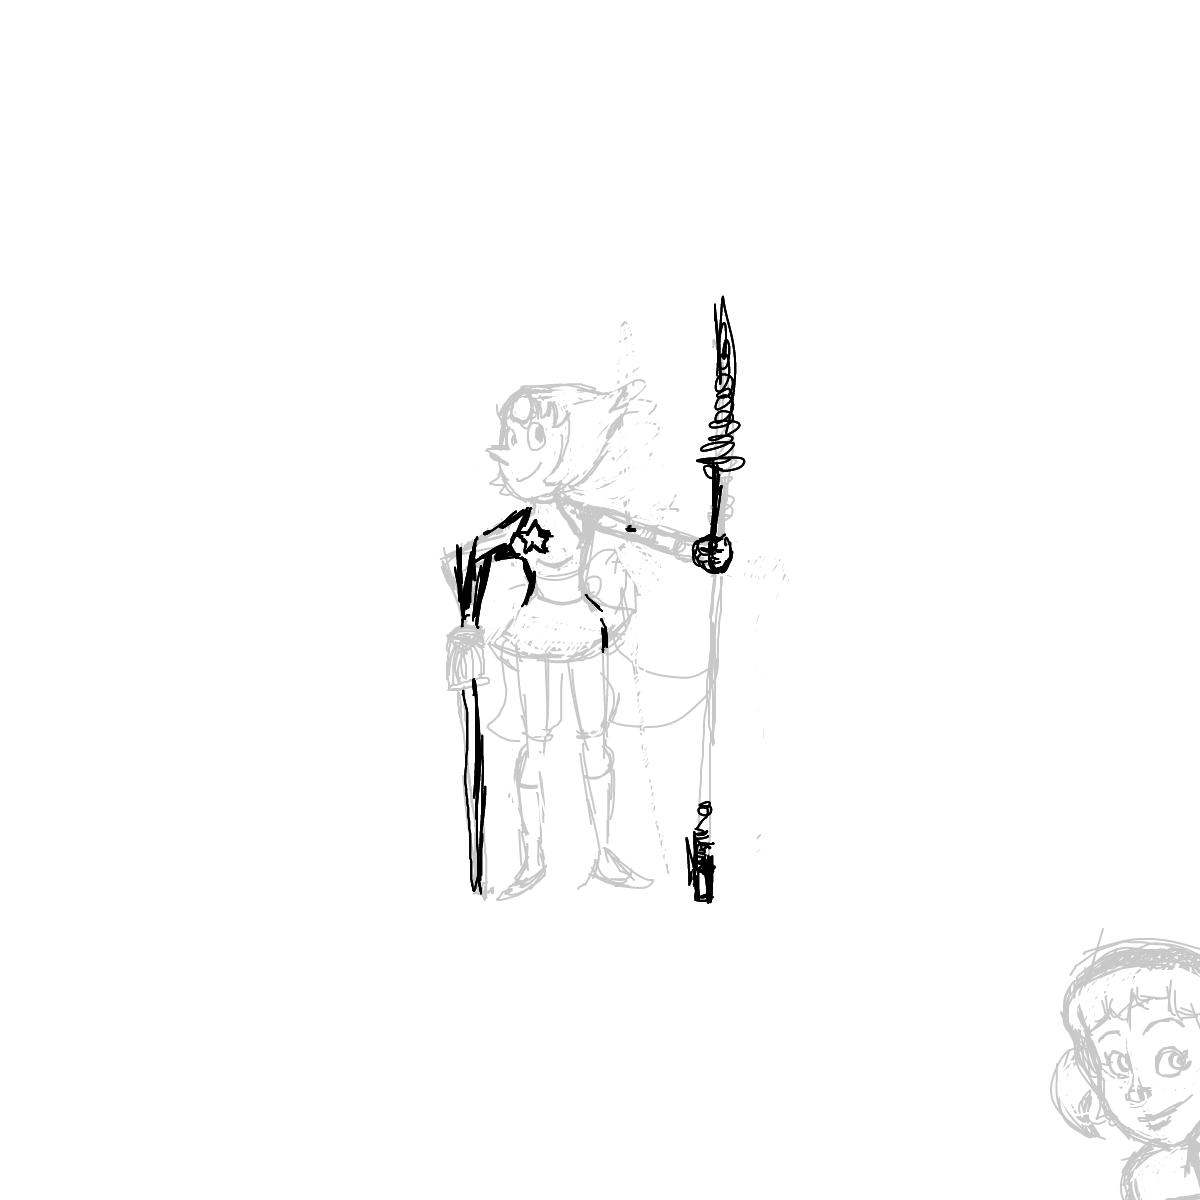 BAAAM drawing#13496 lat:37.2041587829589840lng: 139.7830047607422000